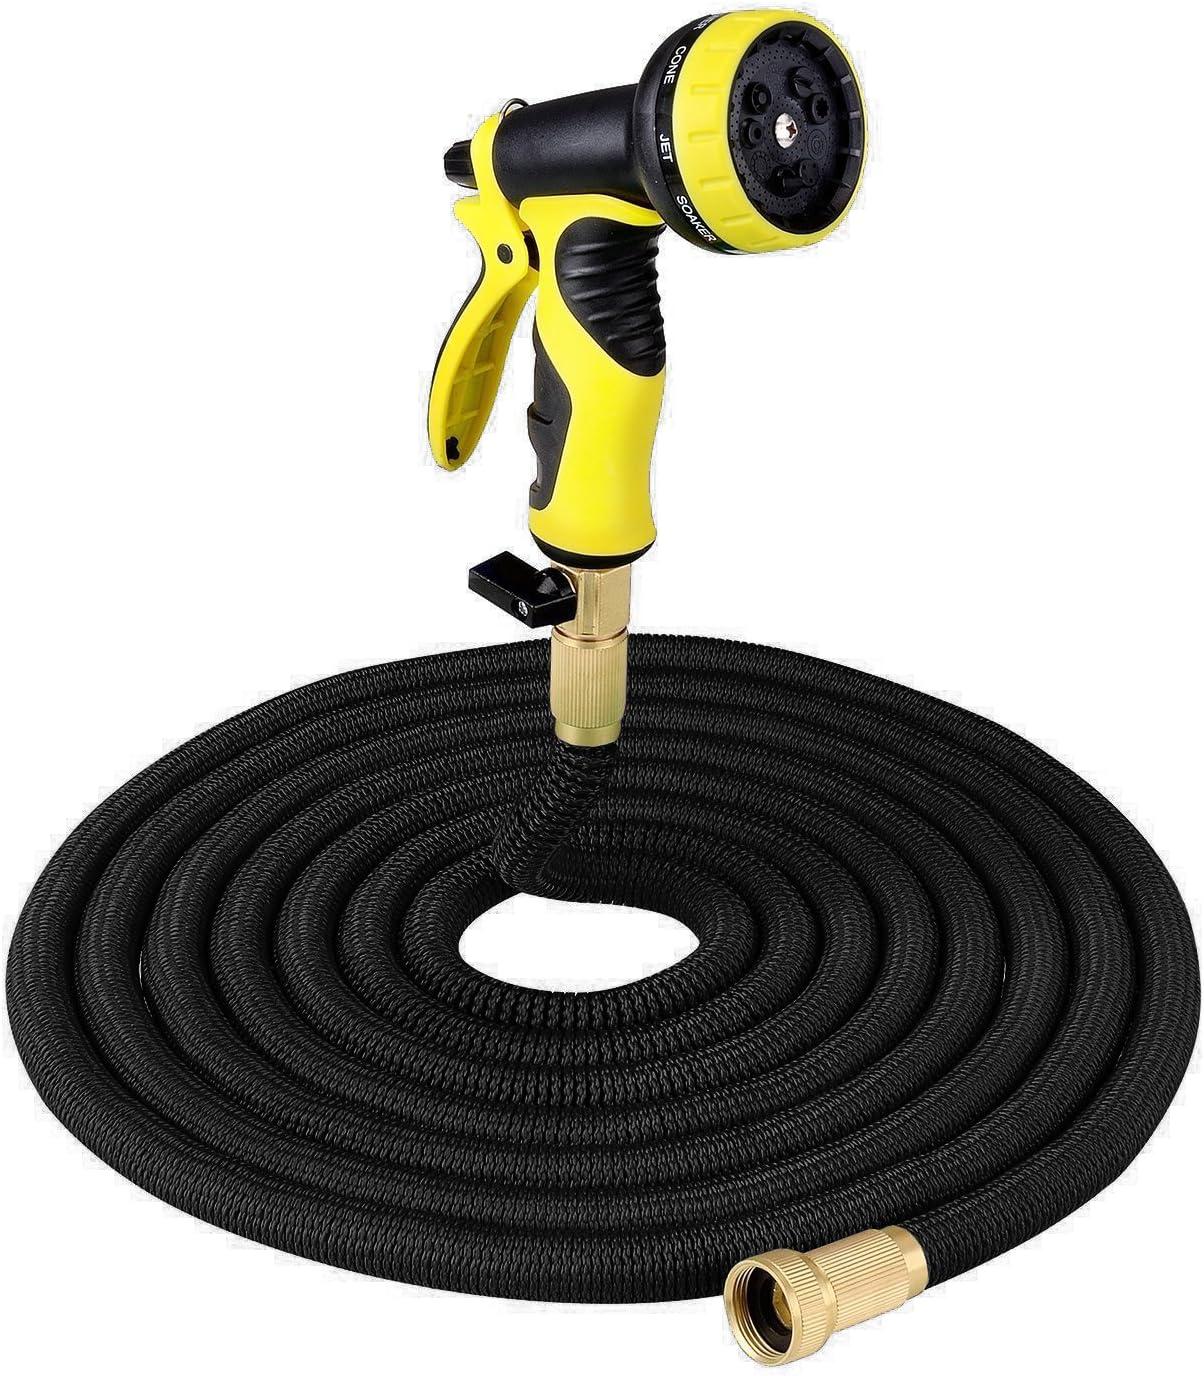 50FT Garden Hose Flexibal Expanding Portable 定価 Expandab Water まとめ買い特価